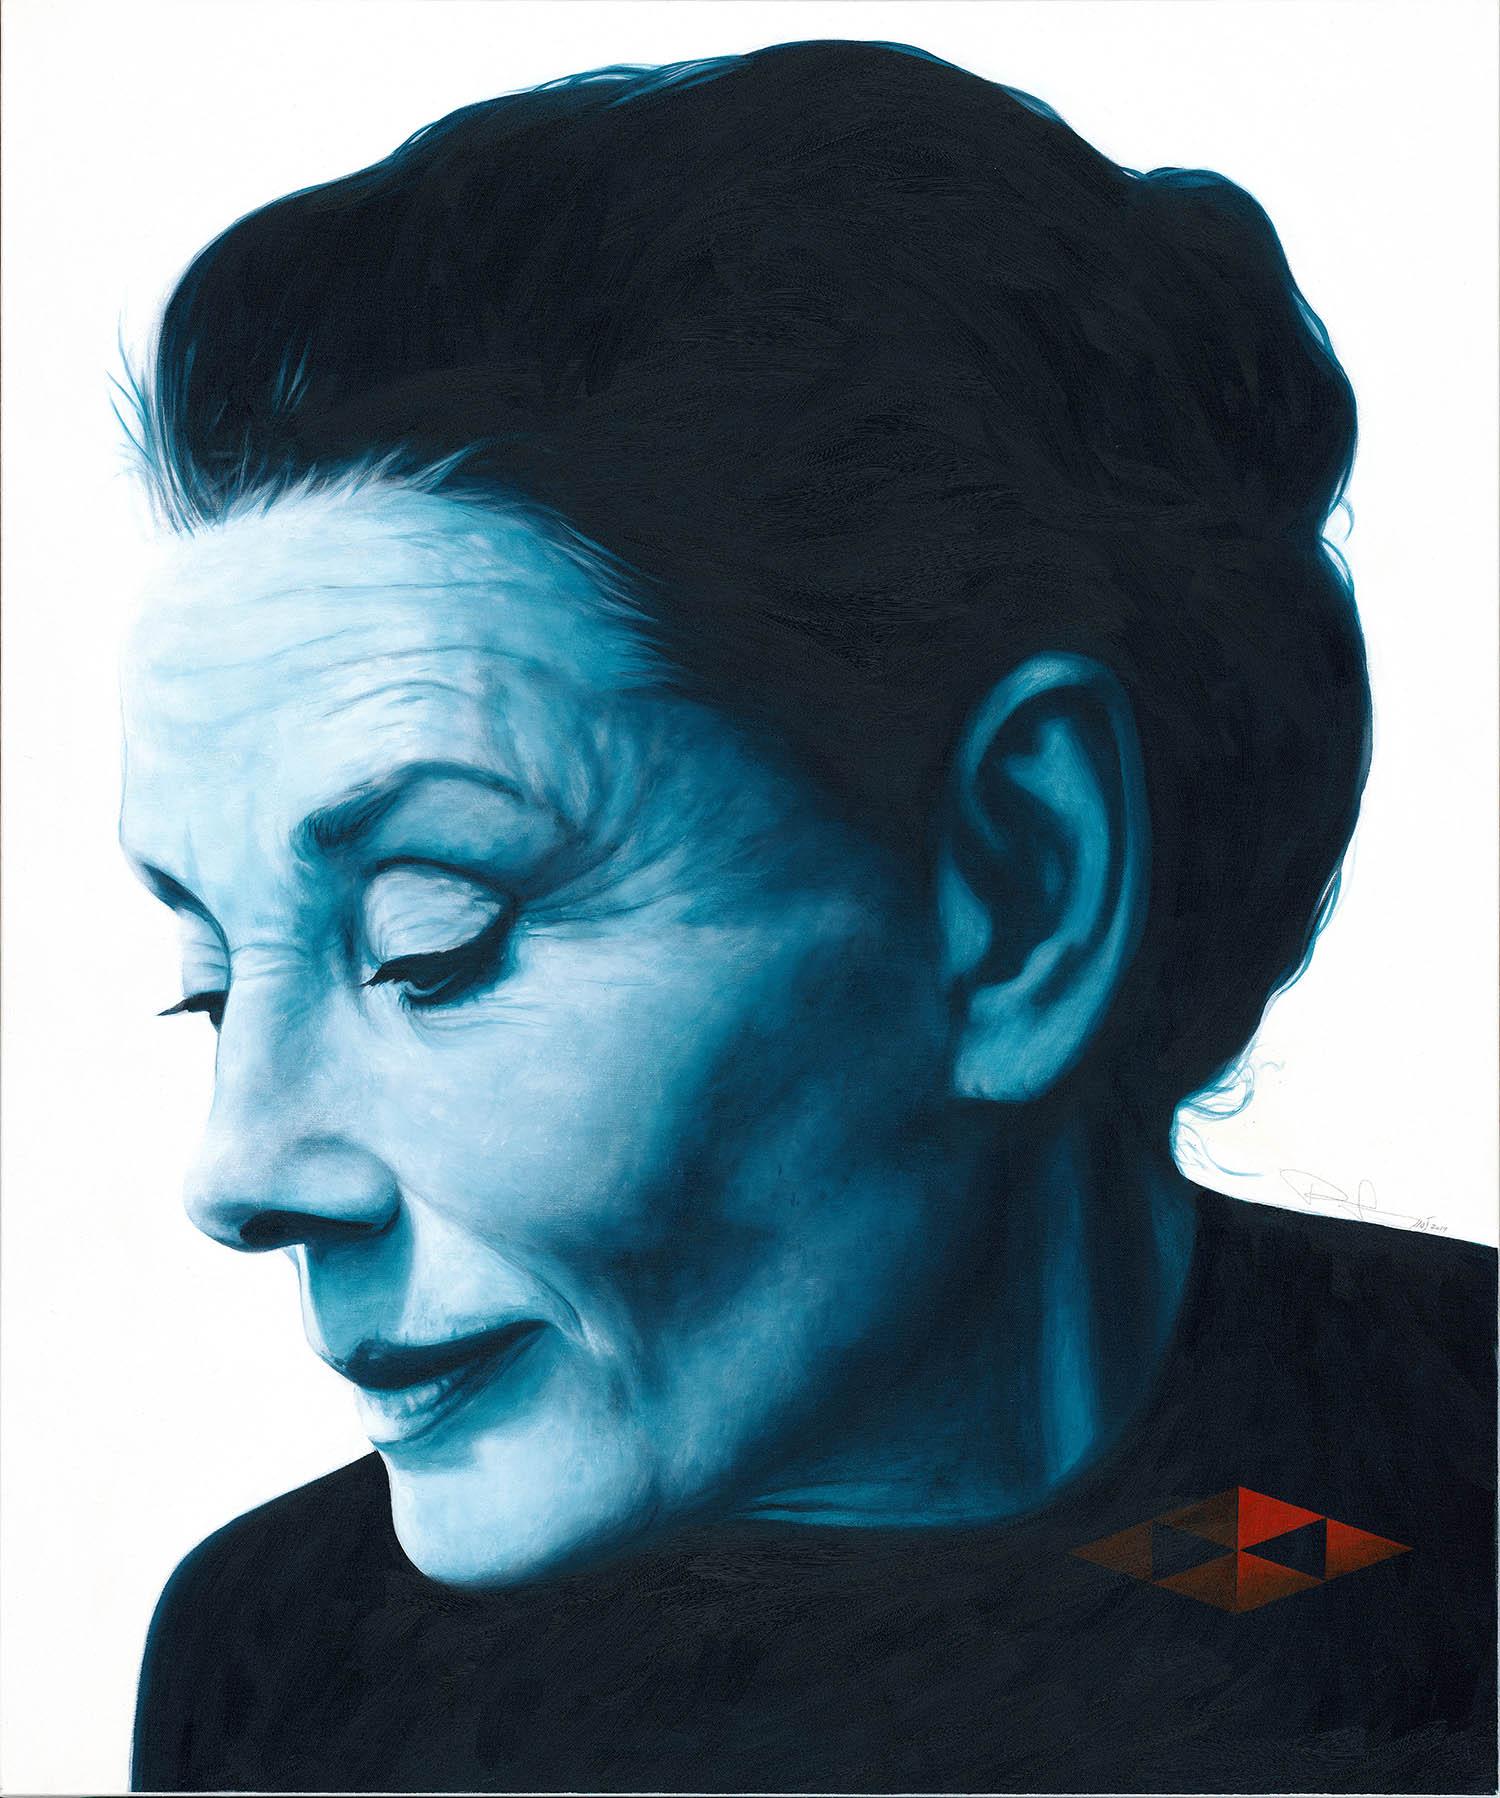 Audrey IV / Acryl auf Leinwand 100x120cm © Rita Stern Miltenberg